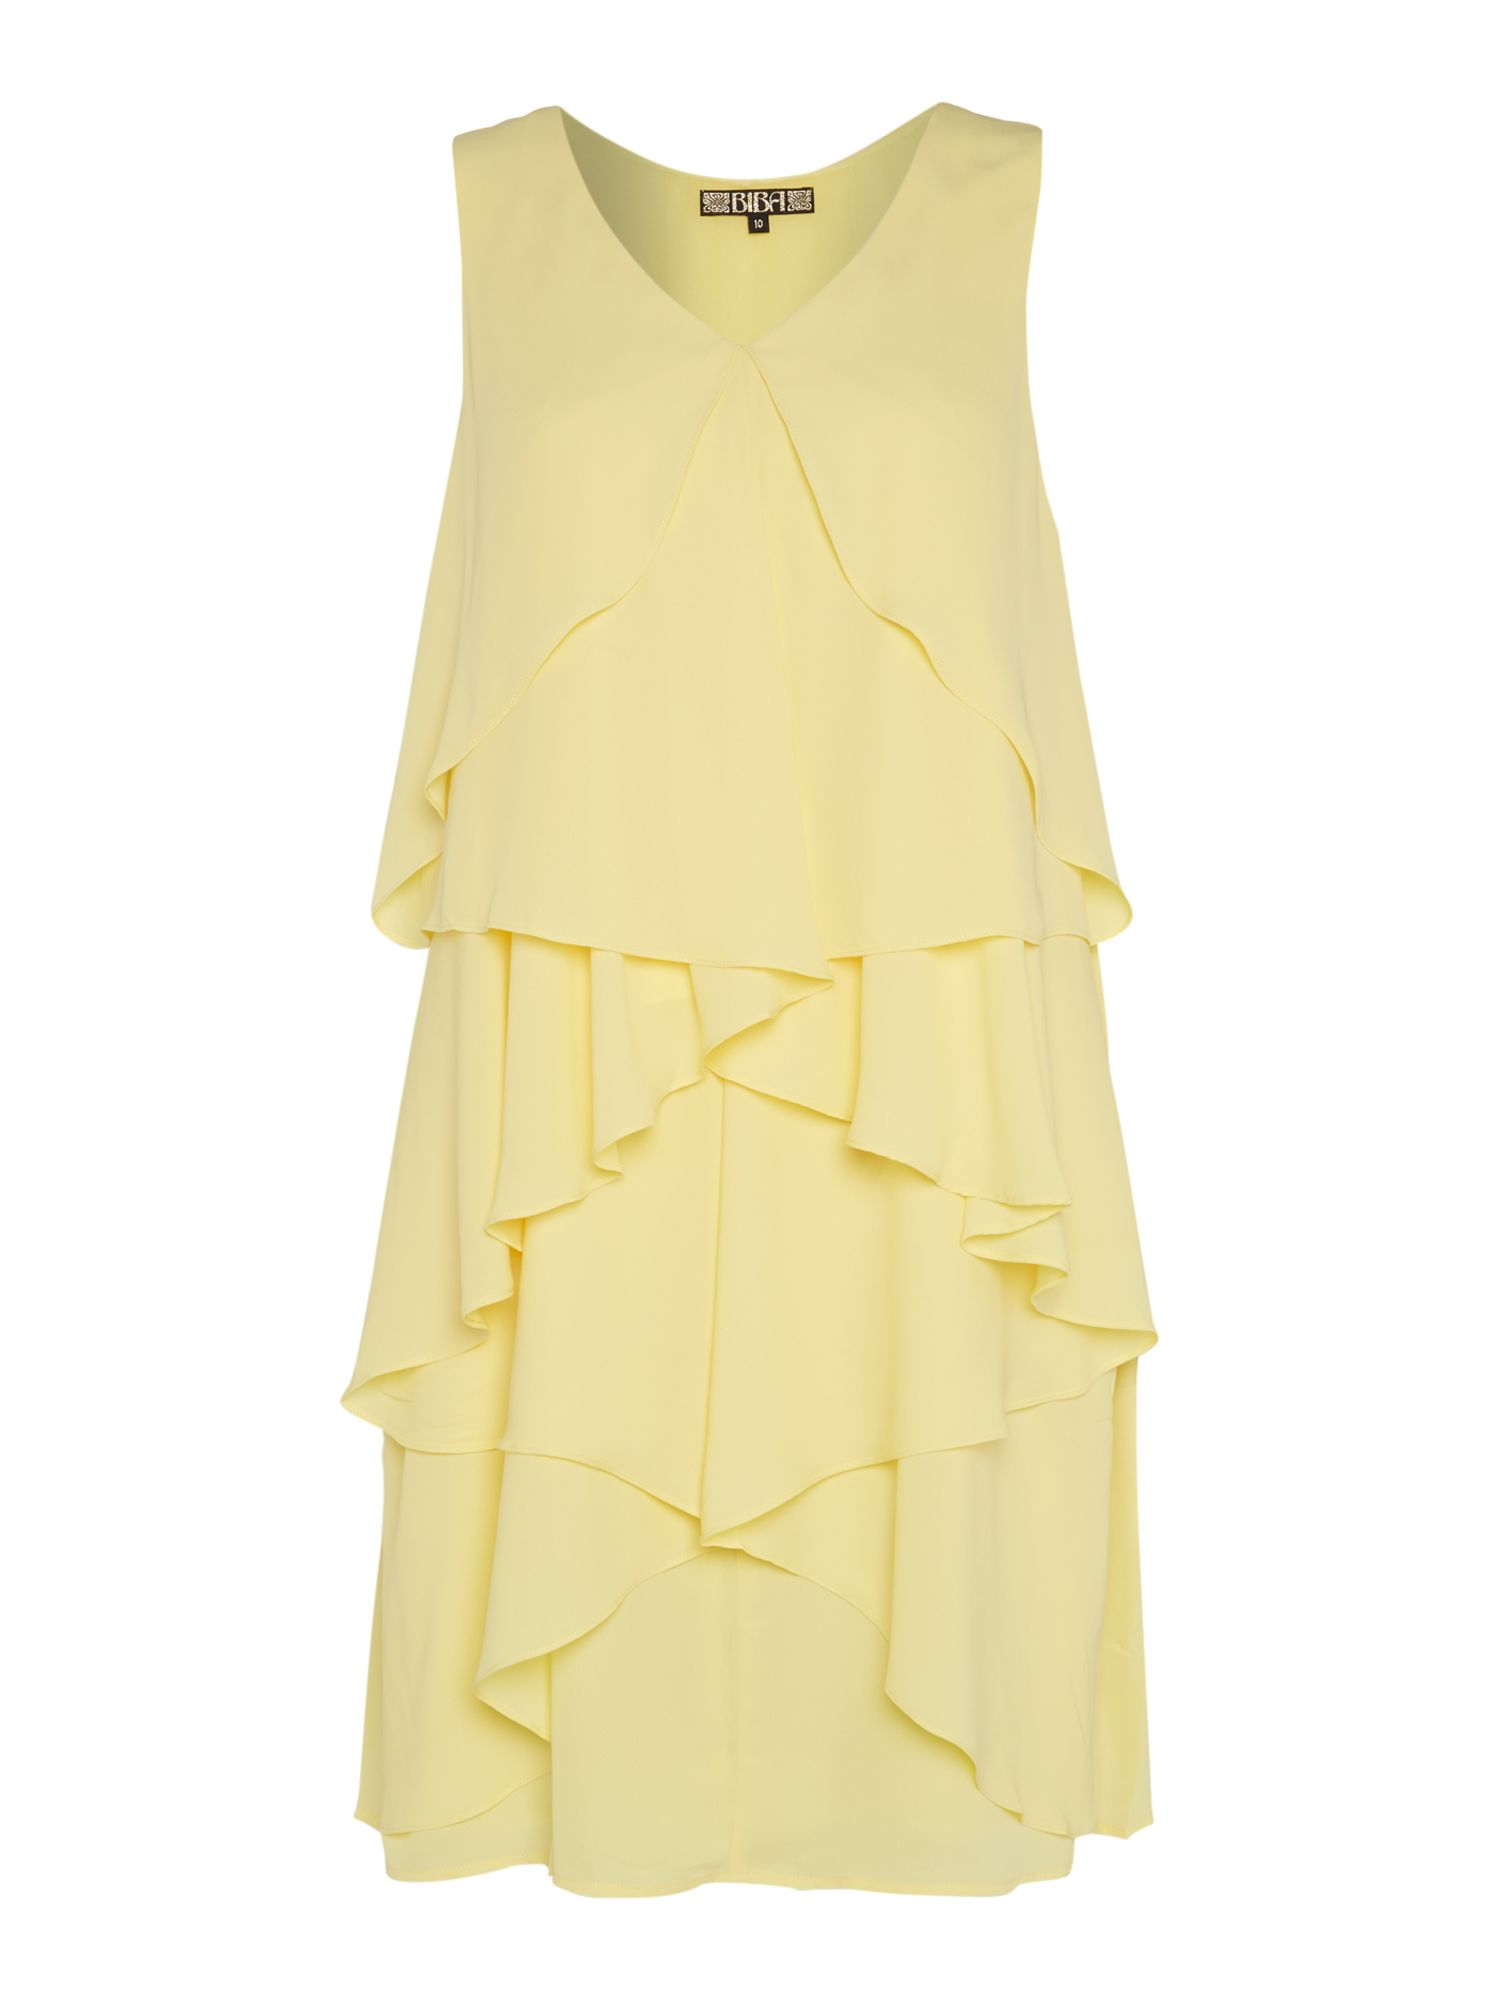 Biba waterfall sleeveless dress in yellow lemon lyst for Waterfall design dress